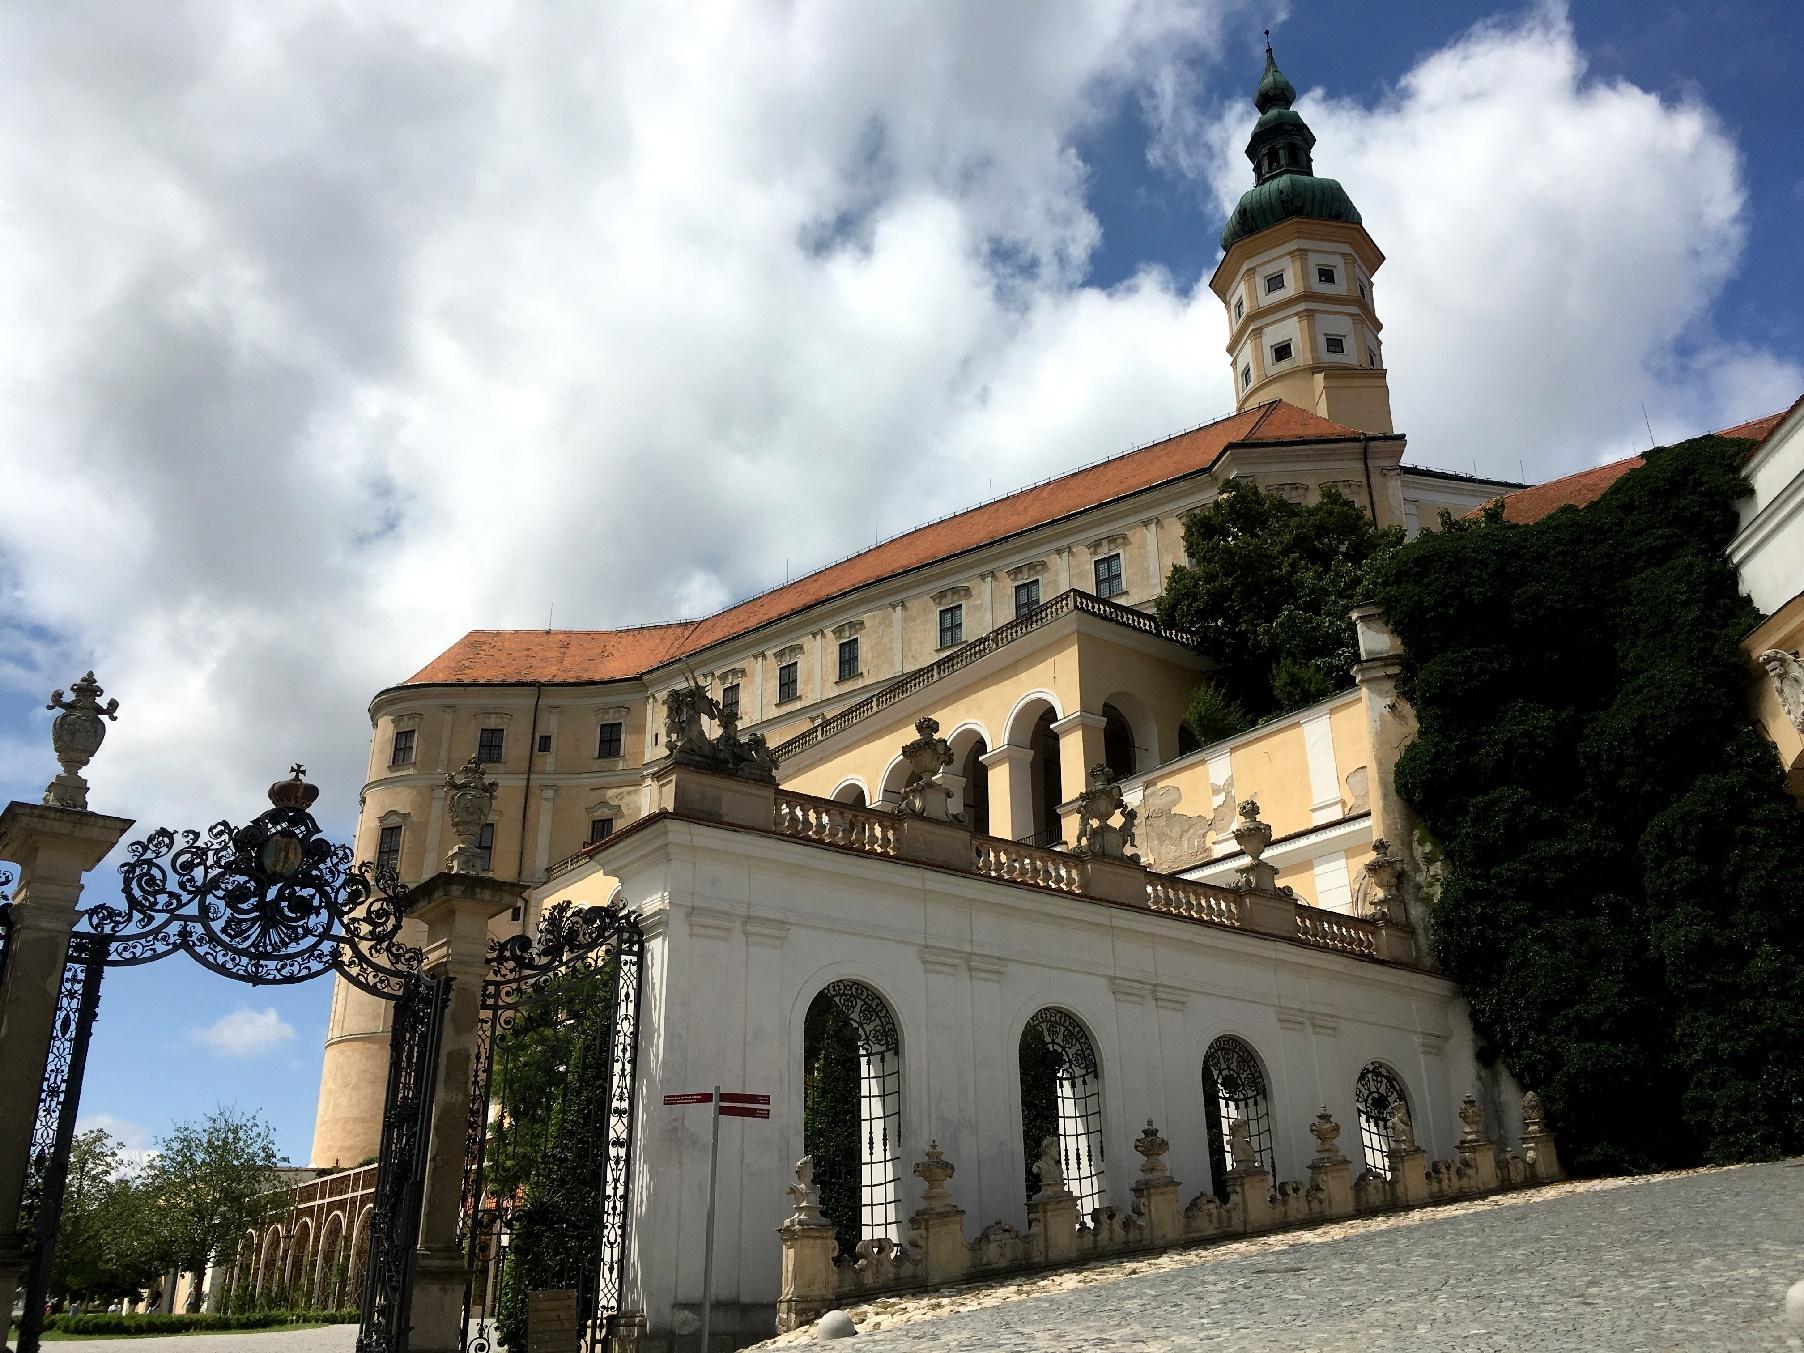 The Mikulov castle, the city landmark!